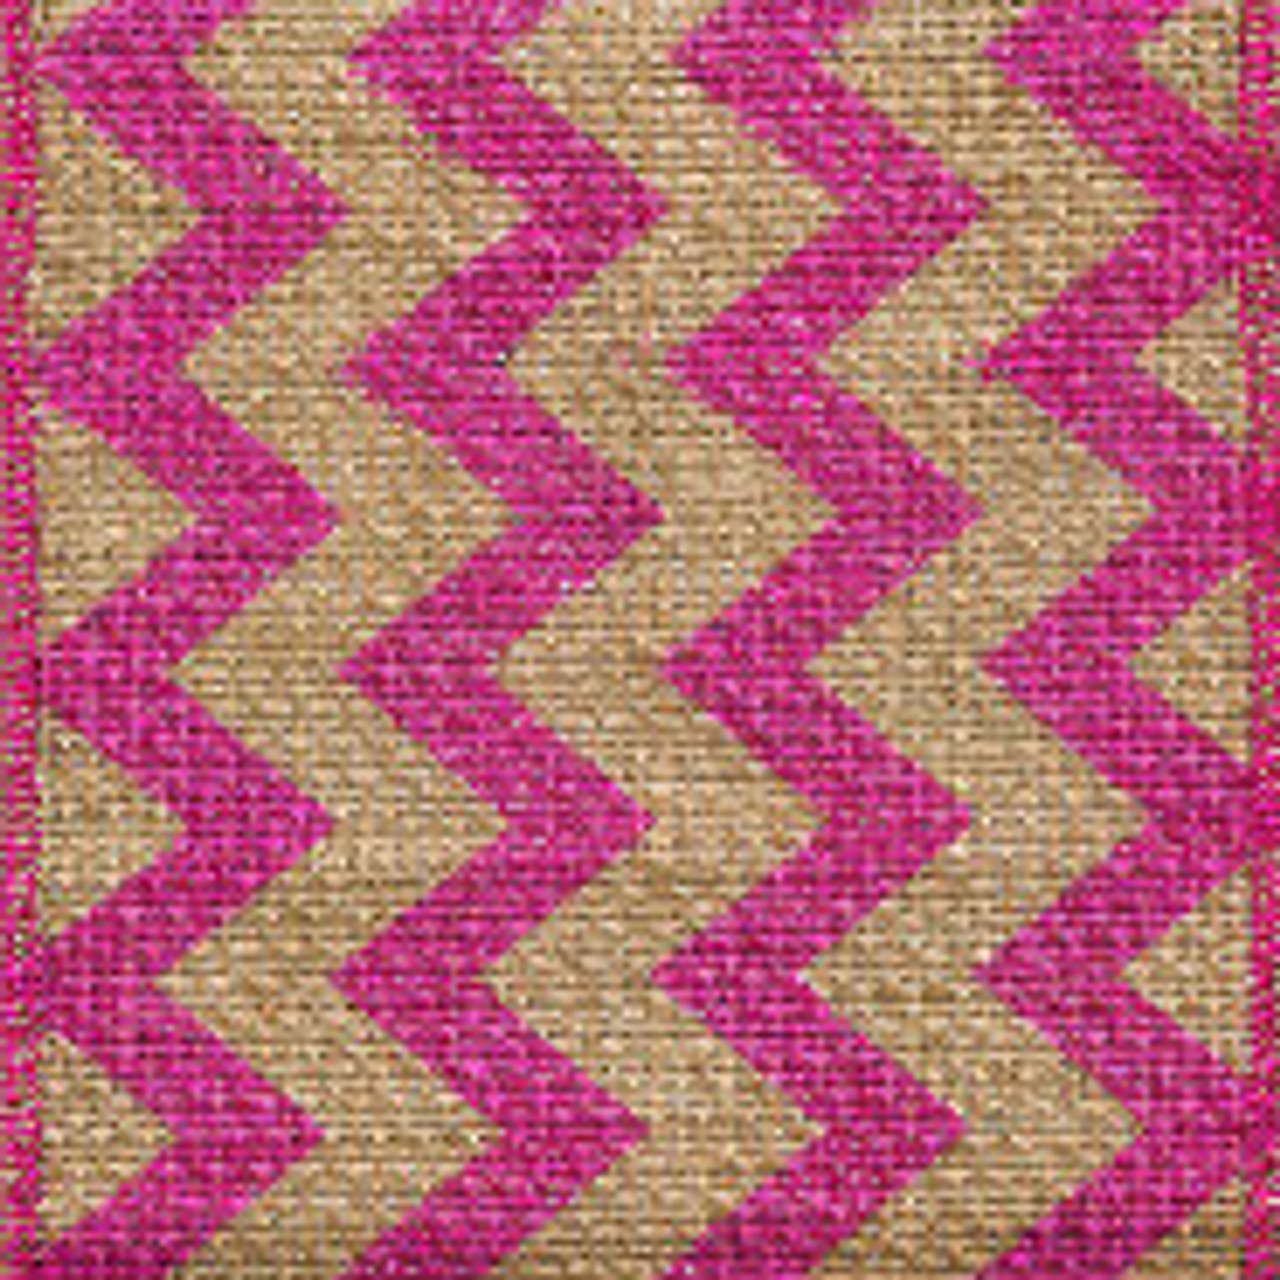 Pink Burlap Zag Striped Ribbon